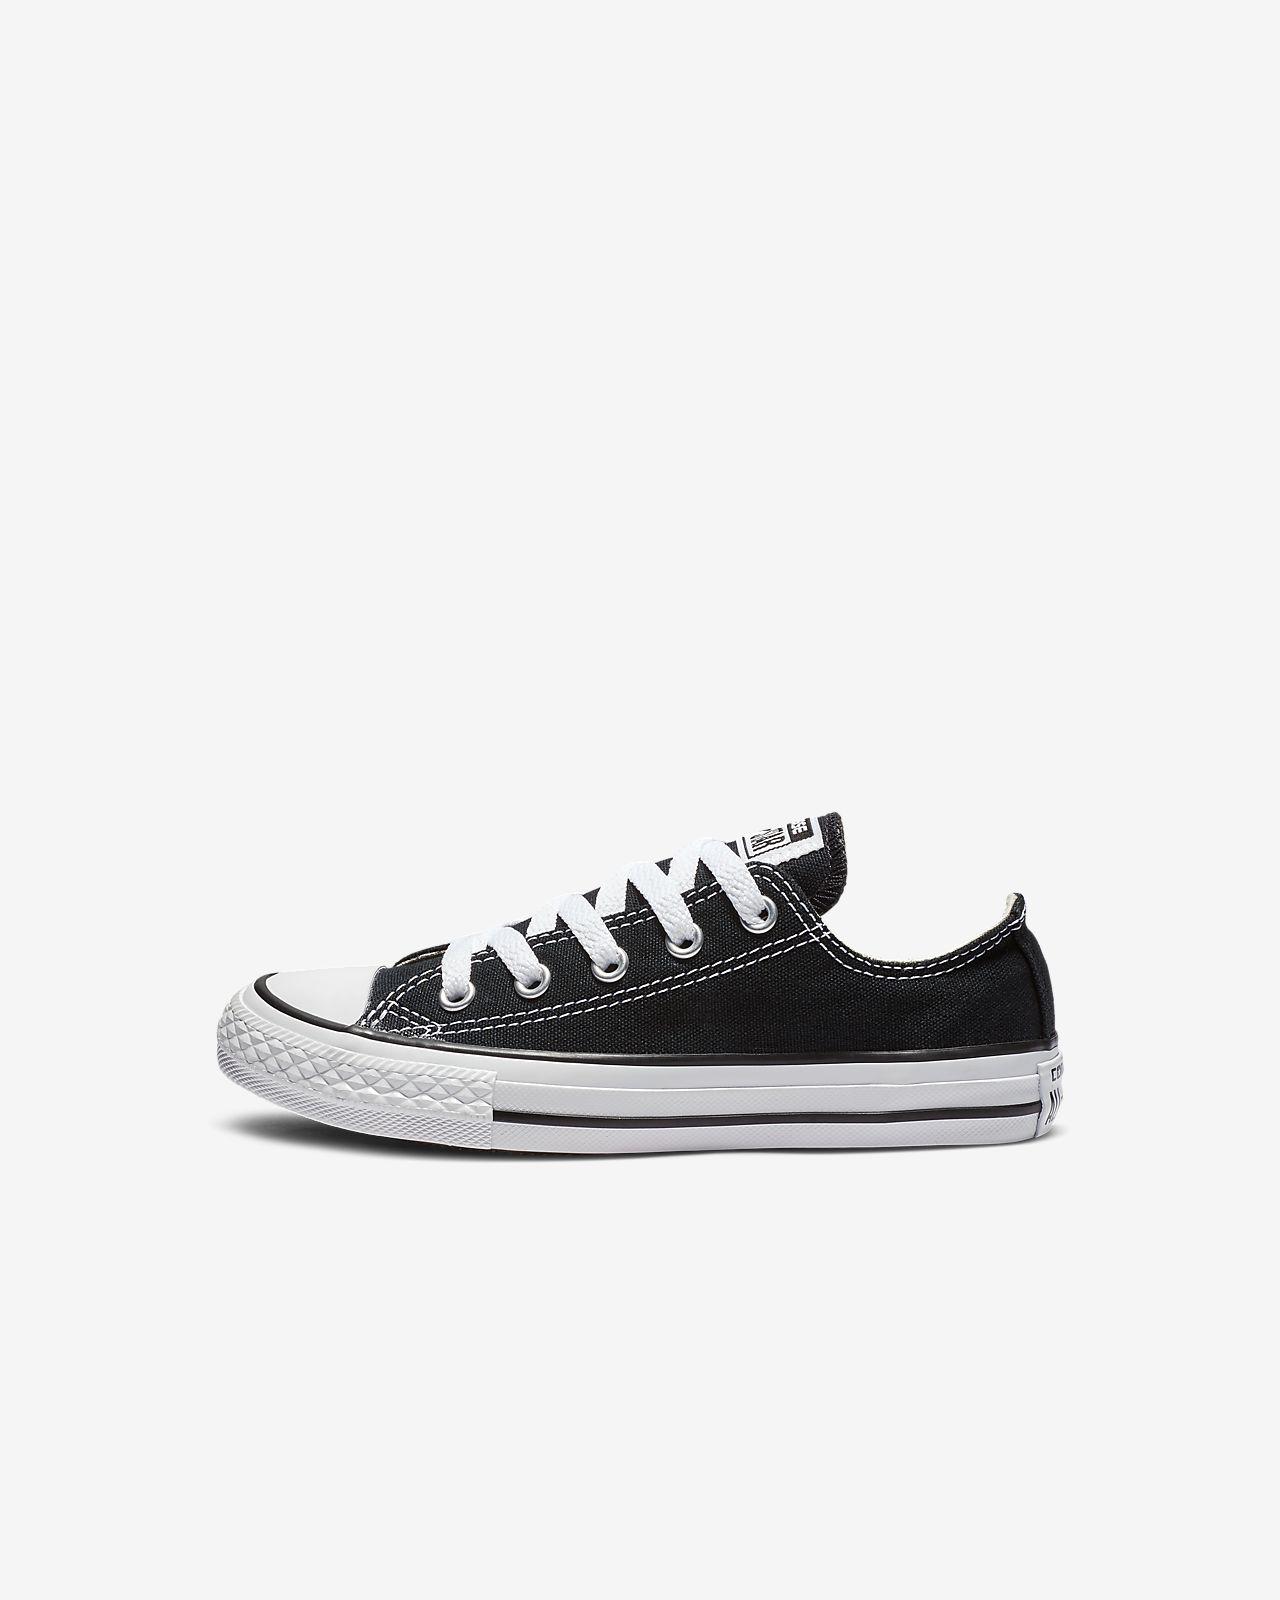 Converse Chuck Taylor All Star Low Top Little Kids' Shoe